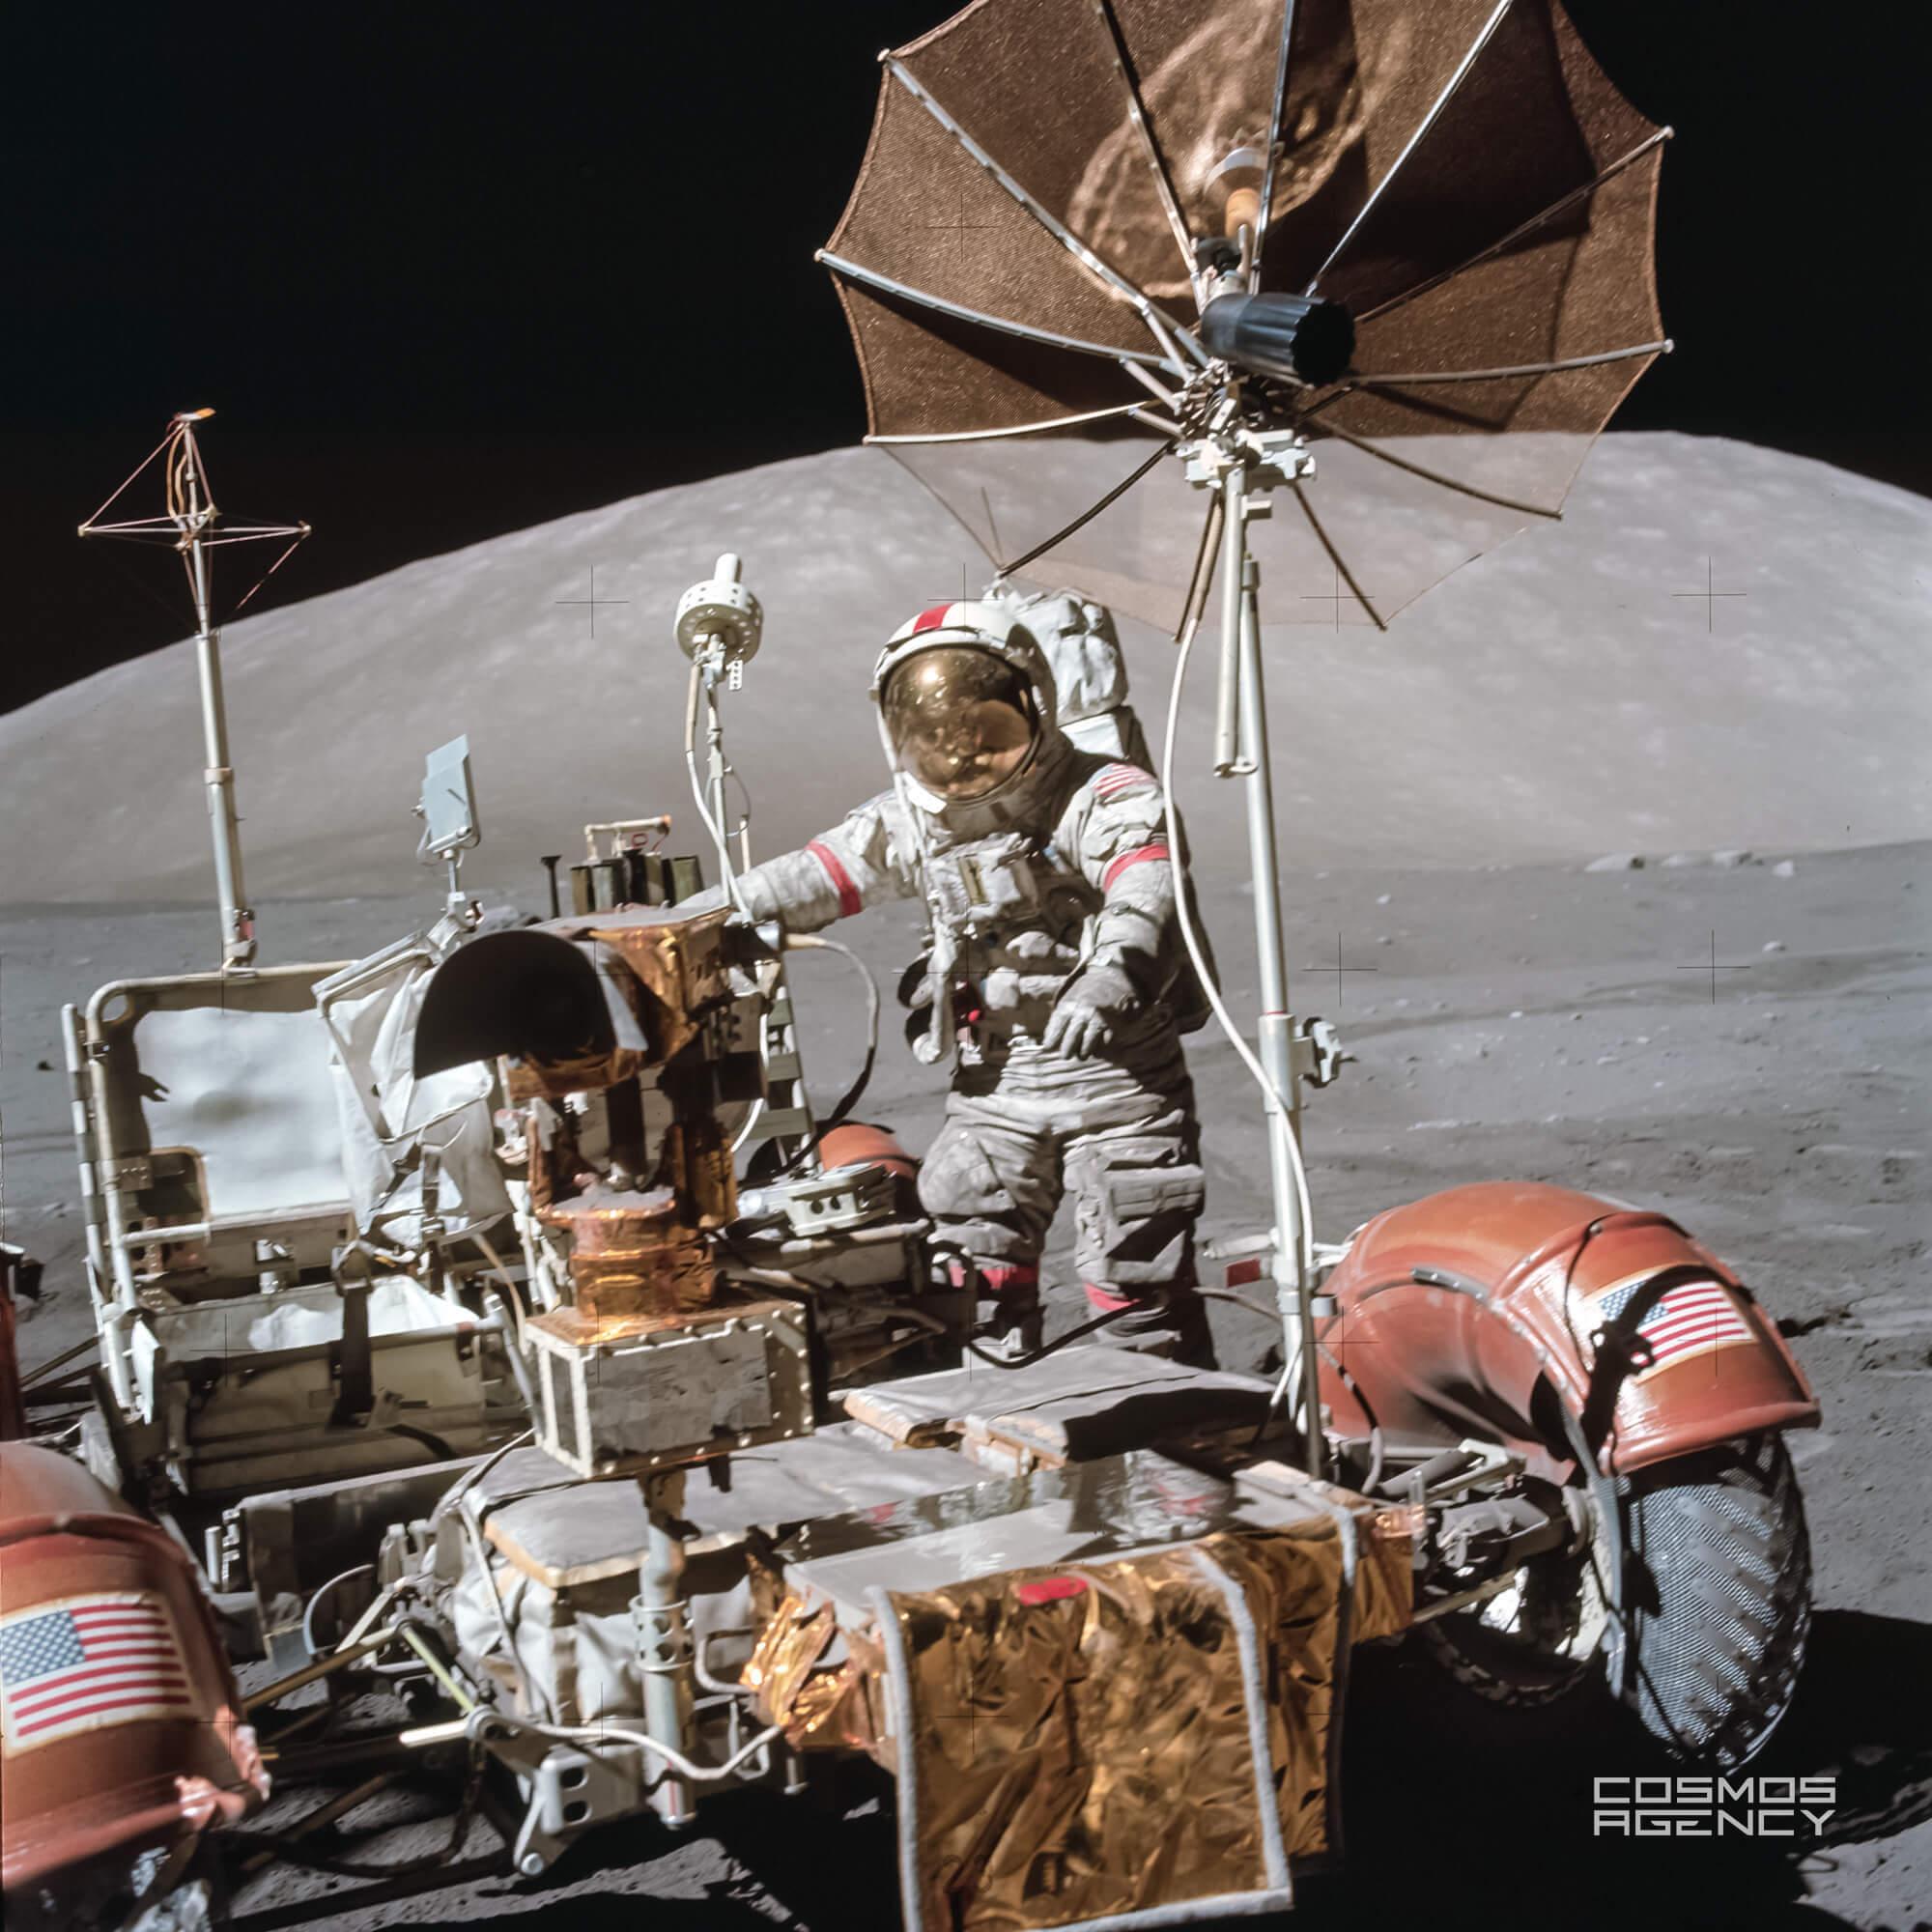 Астронавт NASA Юджин Сернан на ровере, Аполлон 17, 1972